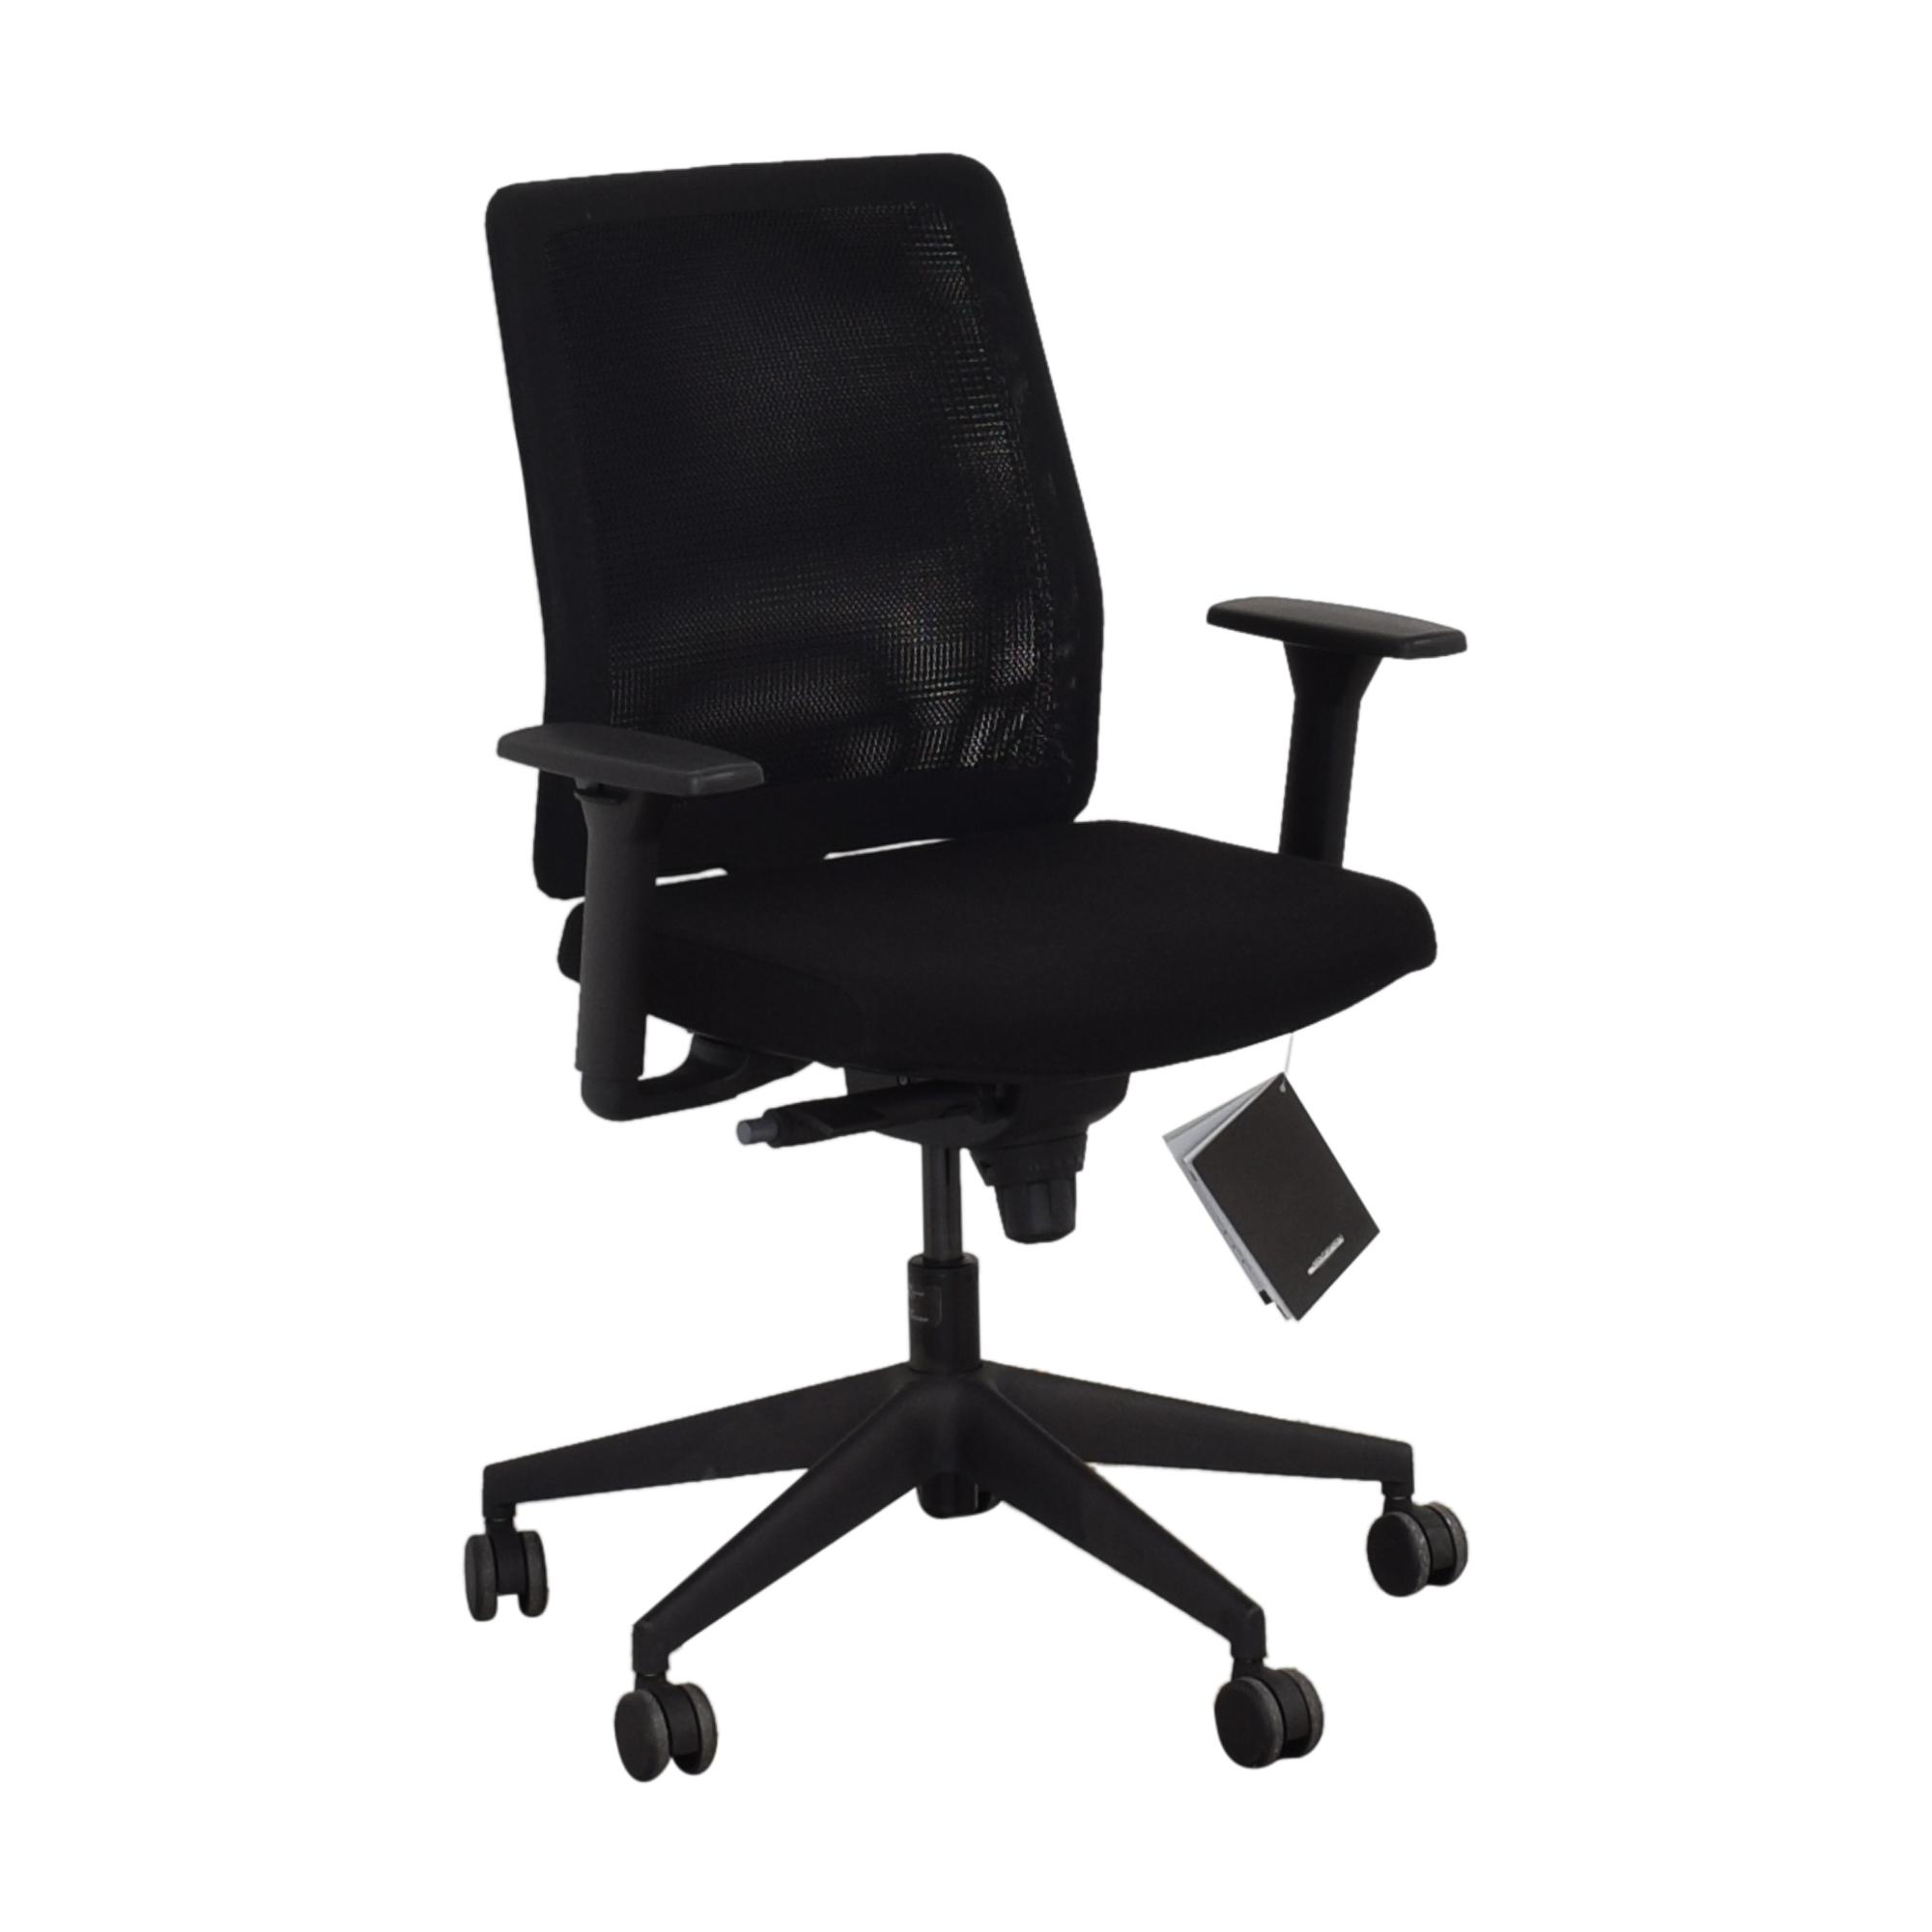 buy Koleksiyon Dastan Operational Chair Koleksiyon Home Office Chairs